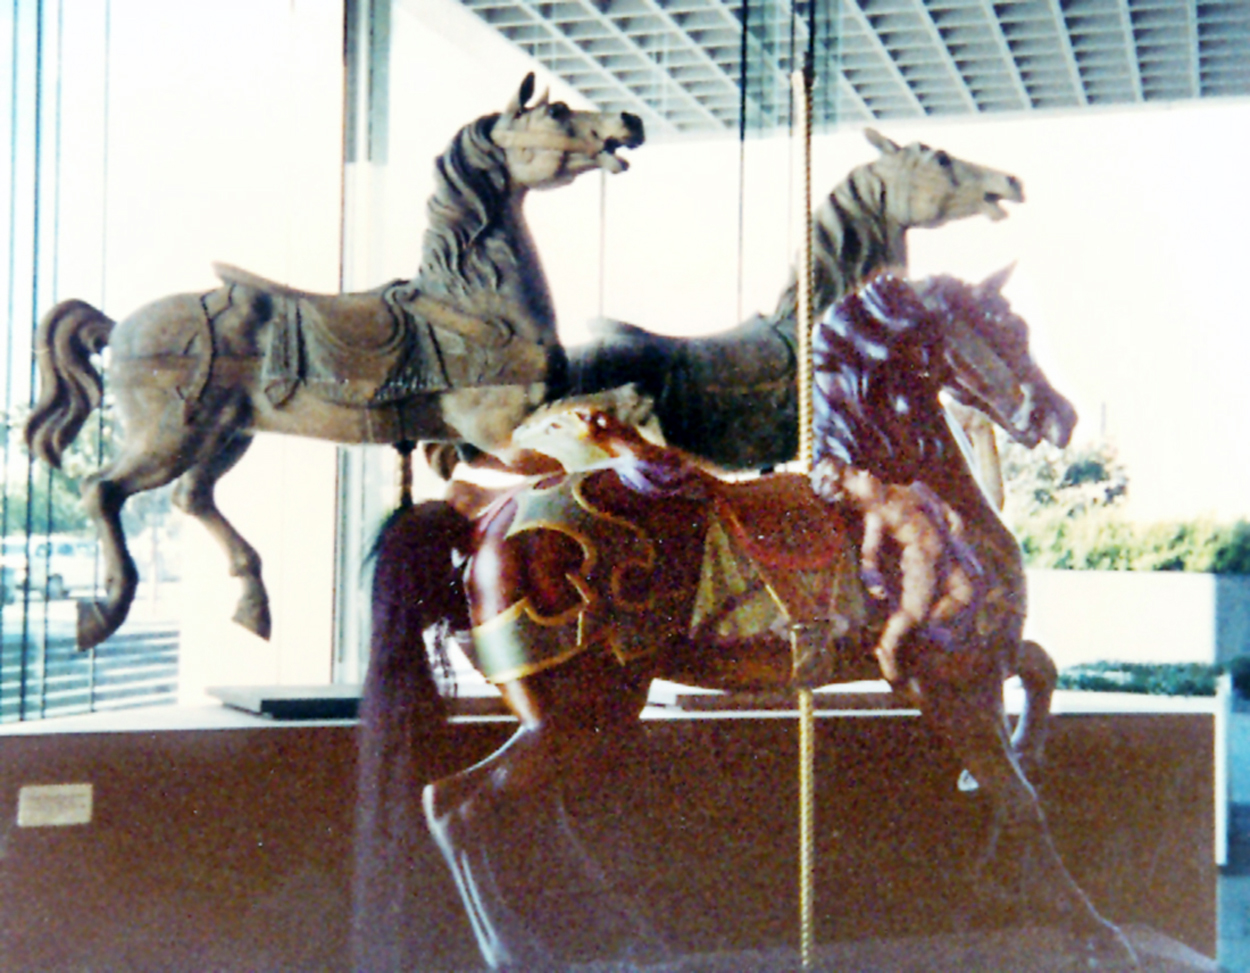 antique-carousel-horses-2-american-carousel-museum-sf-1981